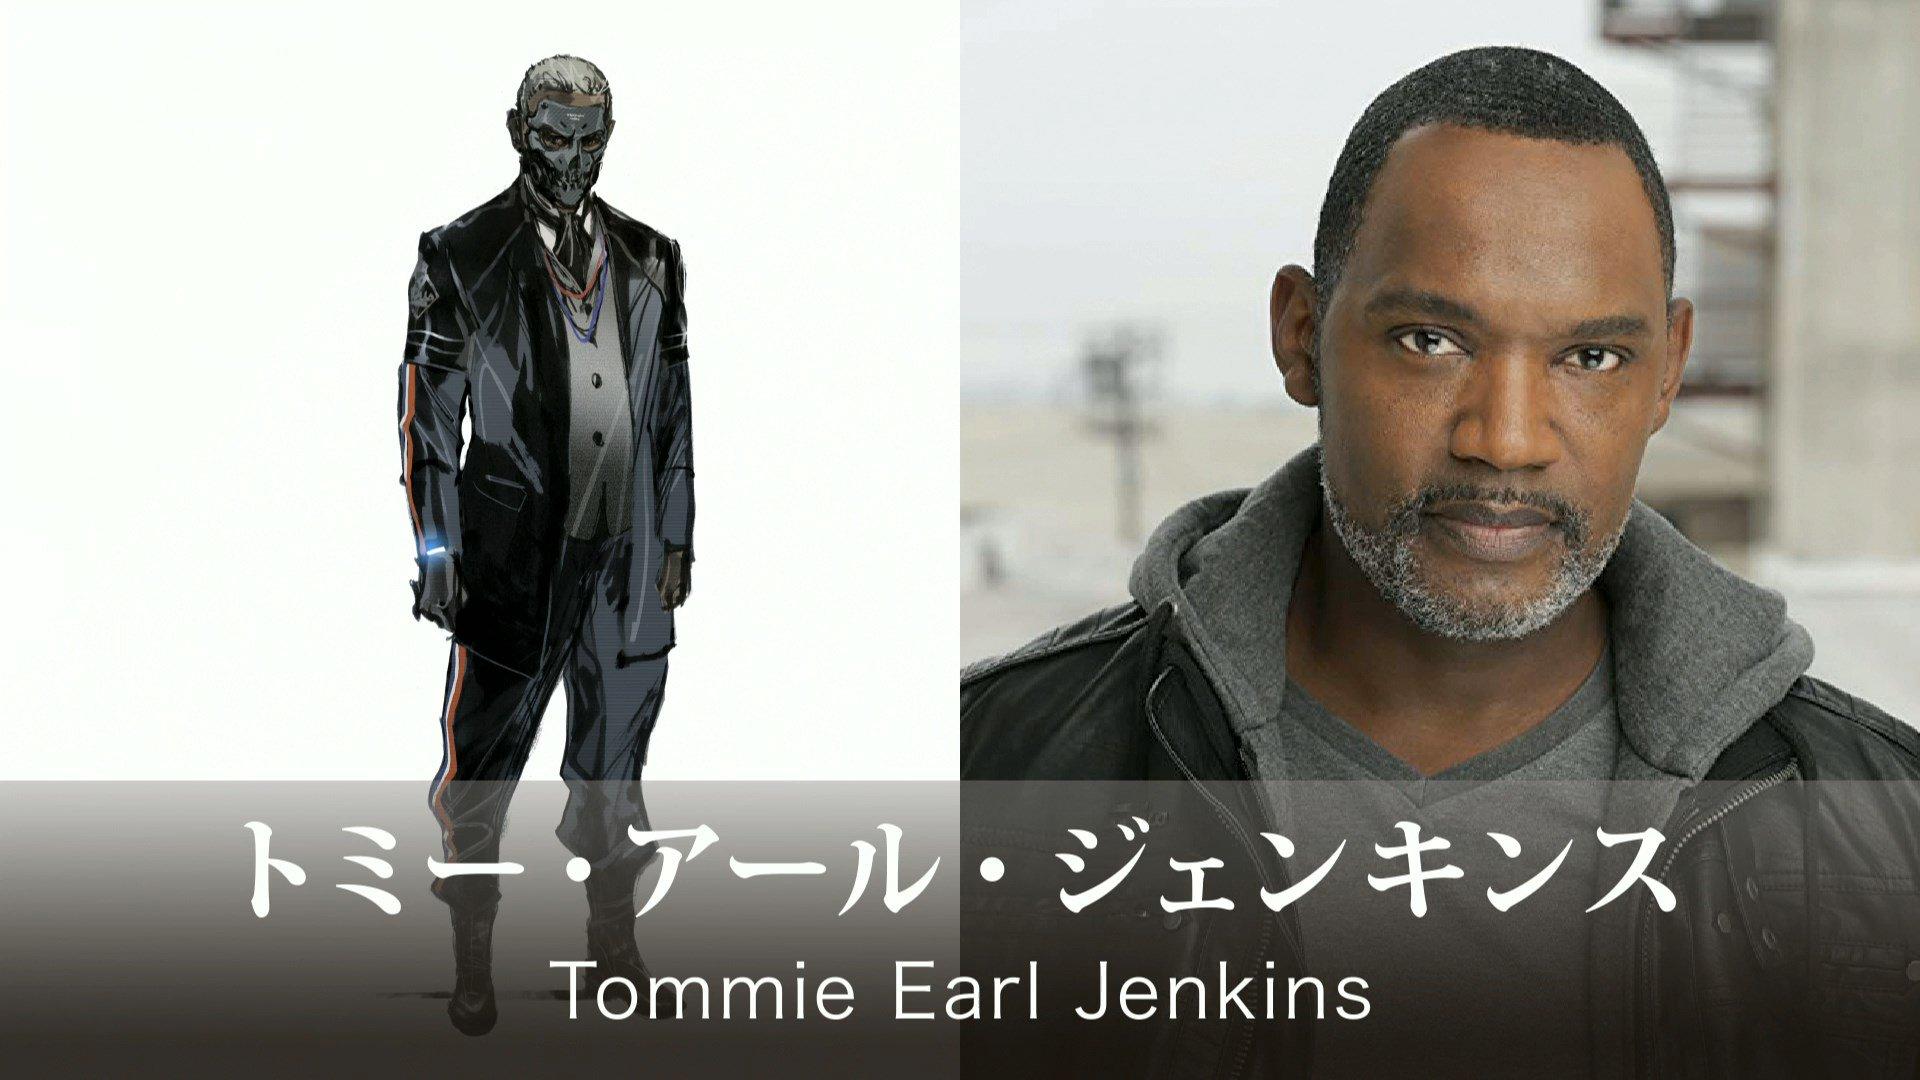 Personagem de Tommie Earl Jenkins em Death Stranding